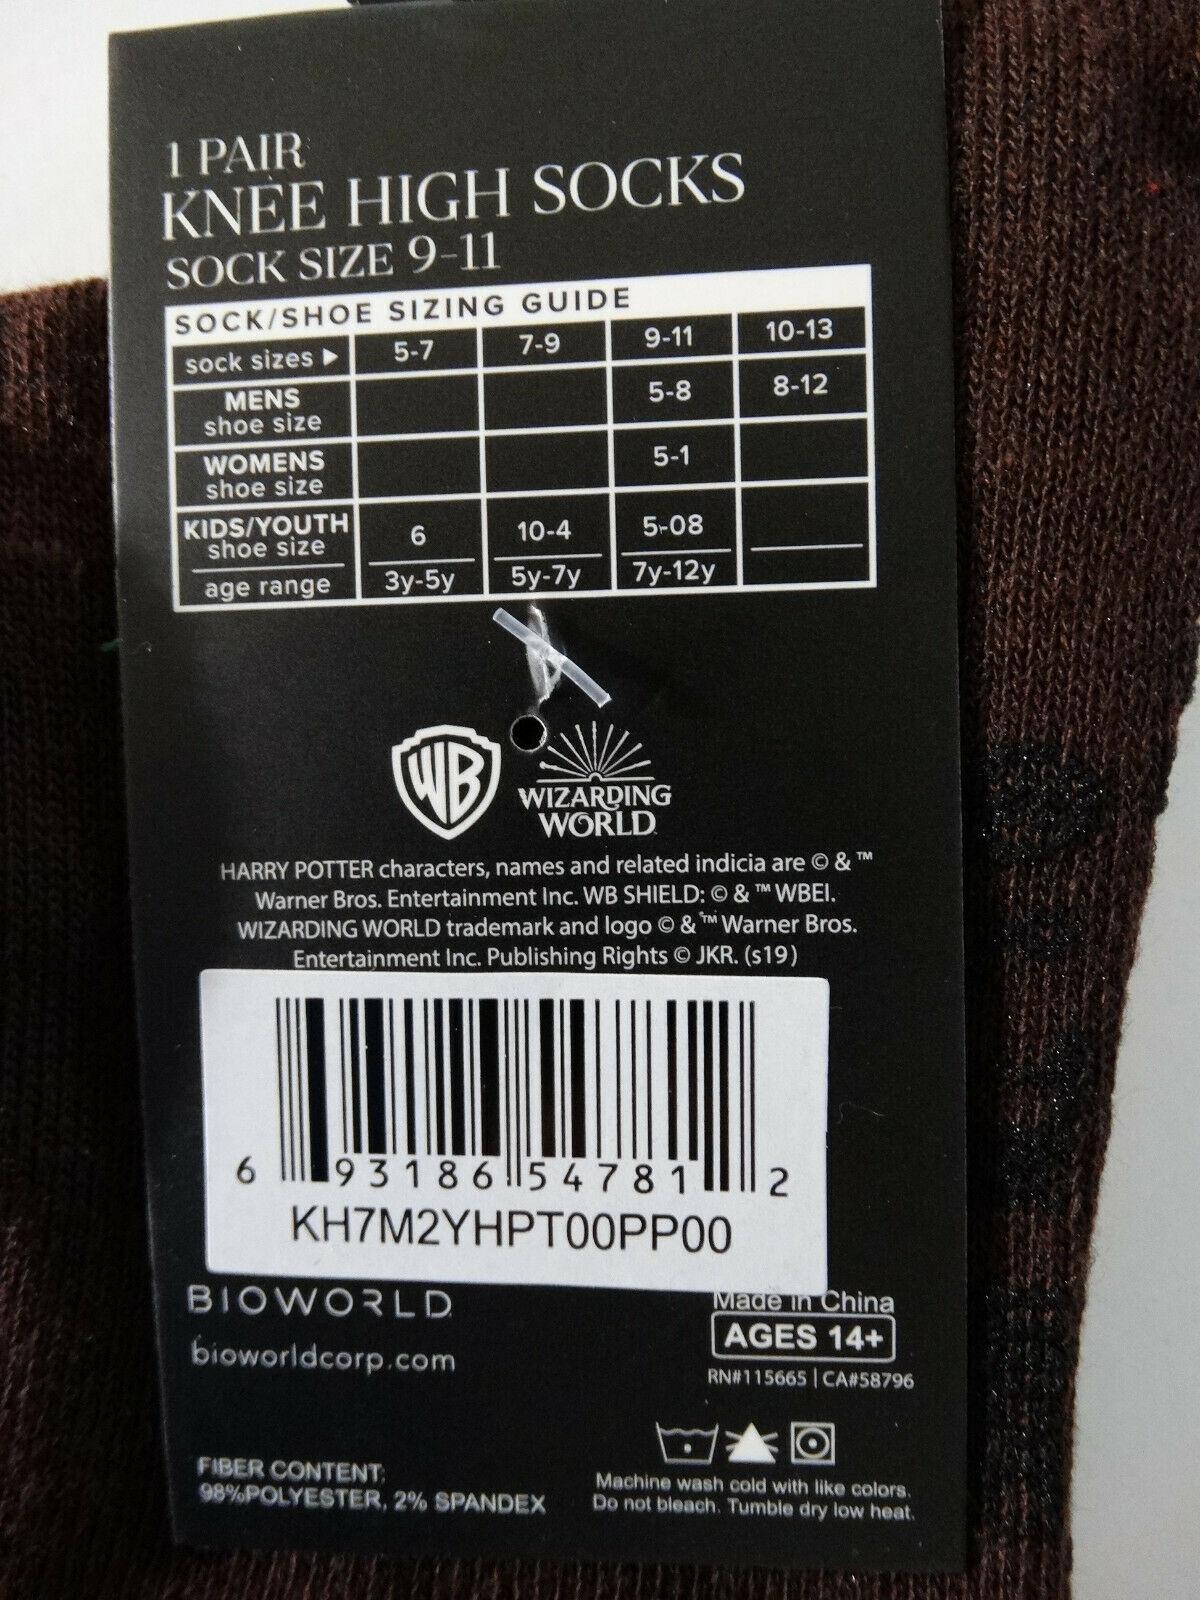 Harry Potter Movie Hogwarts Trunk Adult Knee High Socks